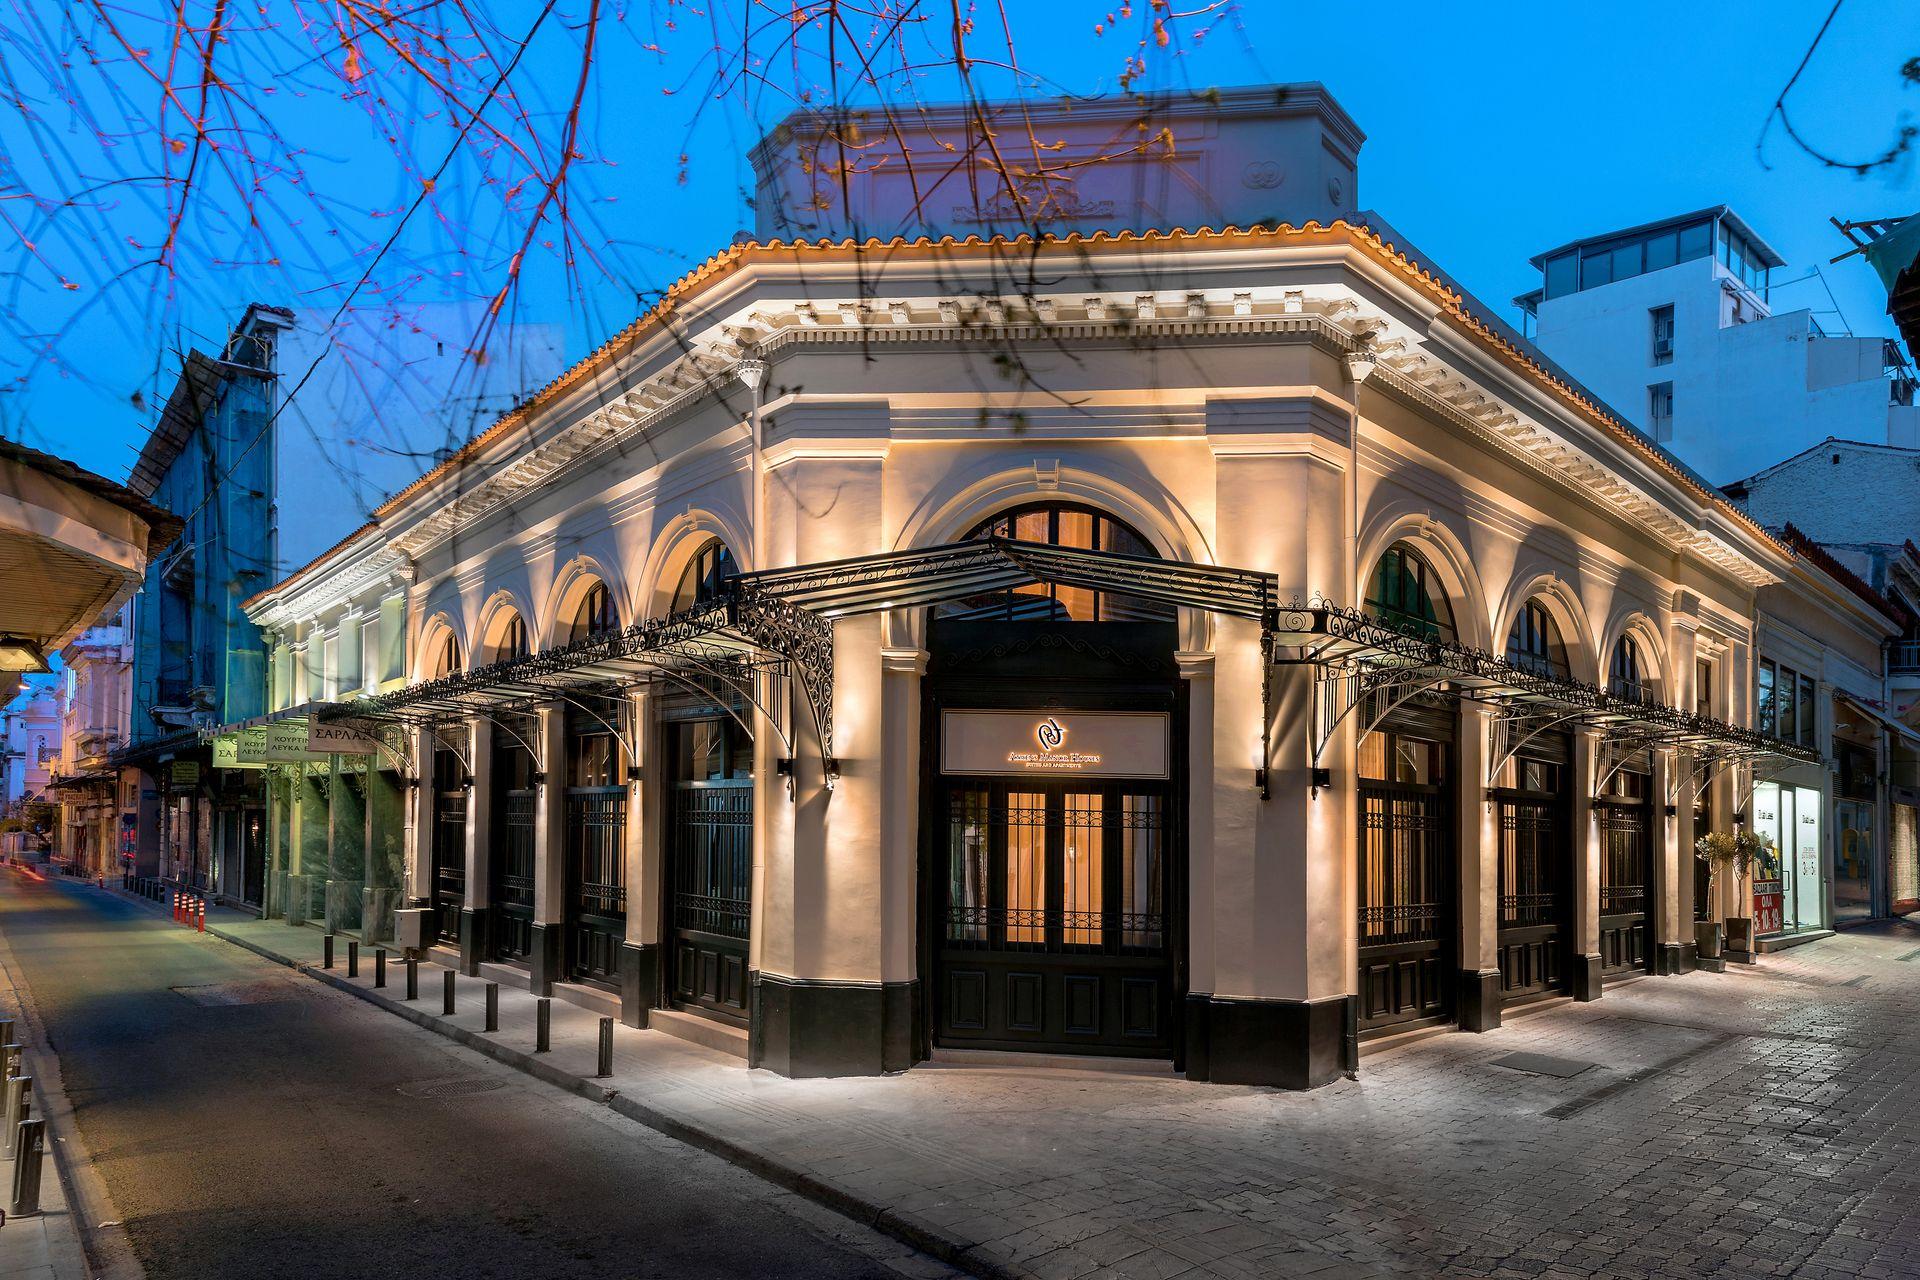 Athens Manor Houses - Αθήνα ✦ -20% ✦ 2 Ημέρες (1 Διανυκτέρευση) ✦ 2 άτομα ✦ Χωρίς Πρωινό ✦ έως 30/09/2020 ✦ Στο Κέντρο της Πόλης!